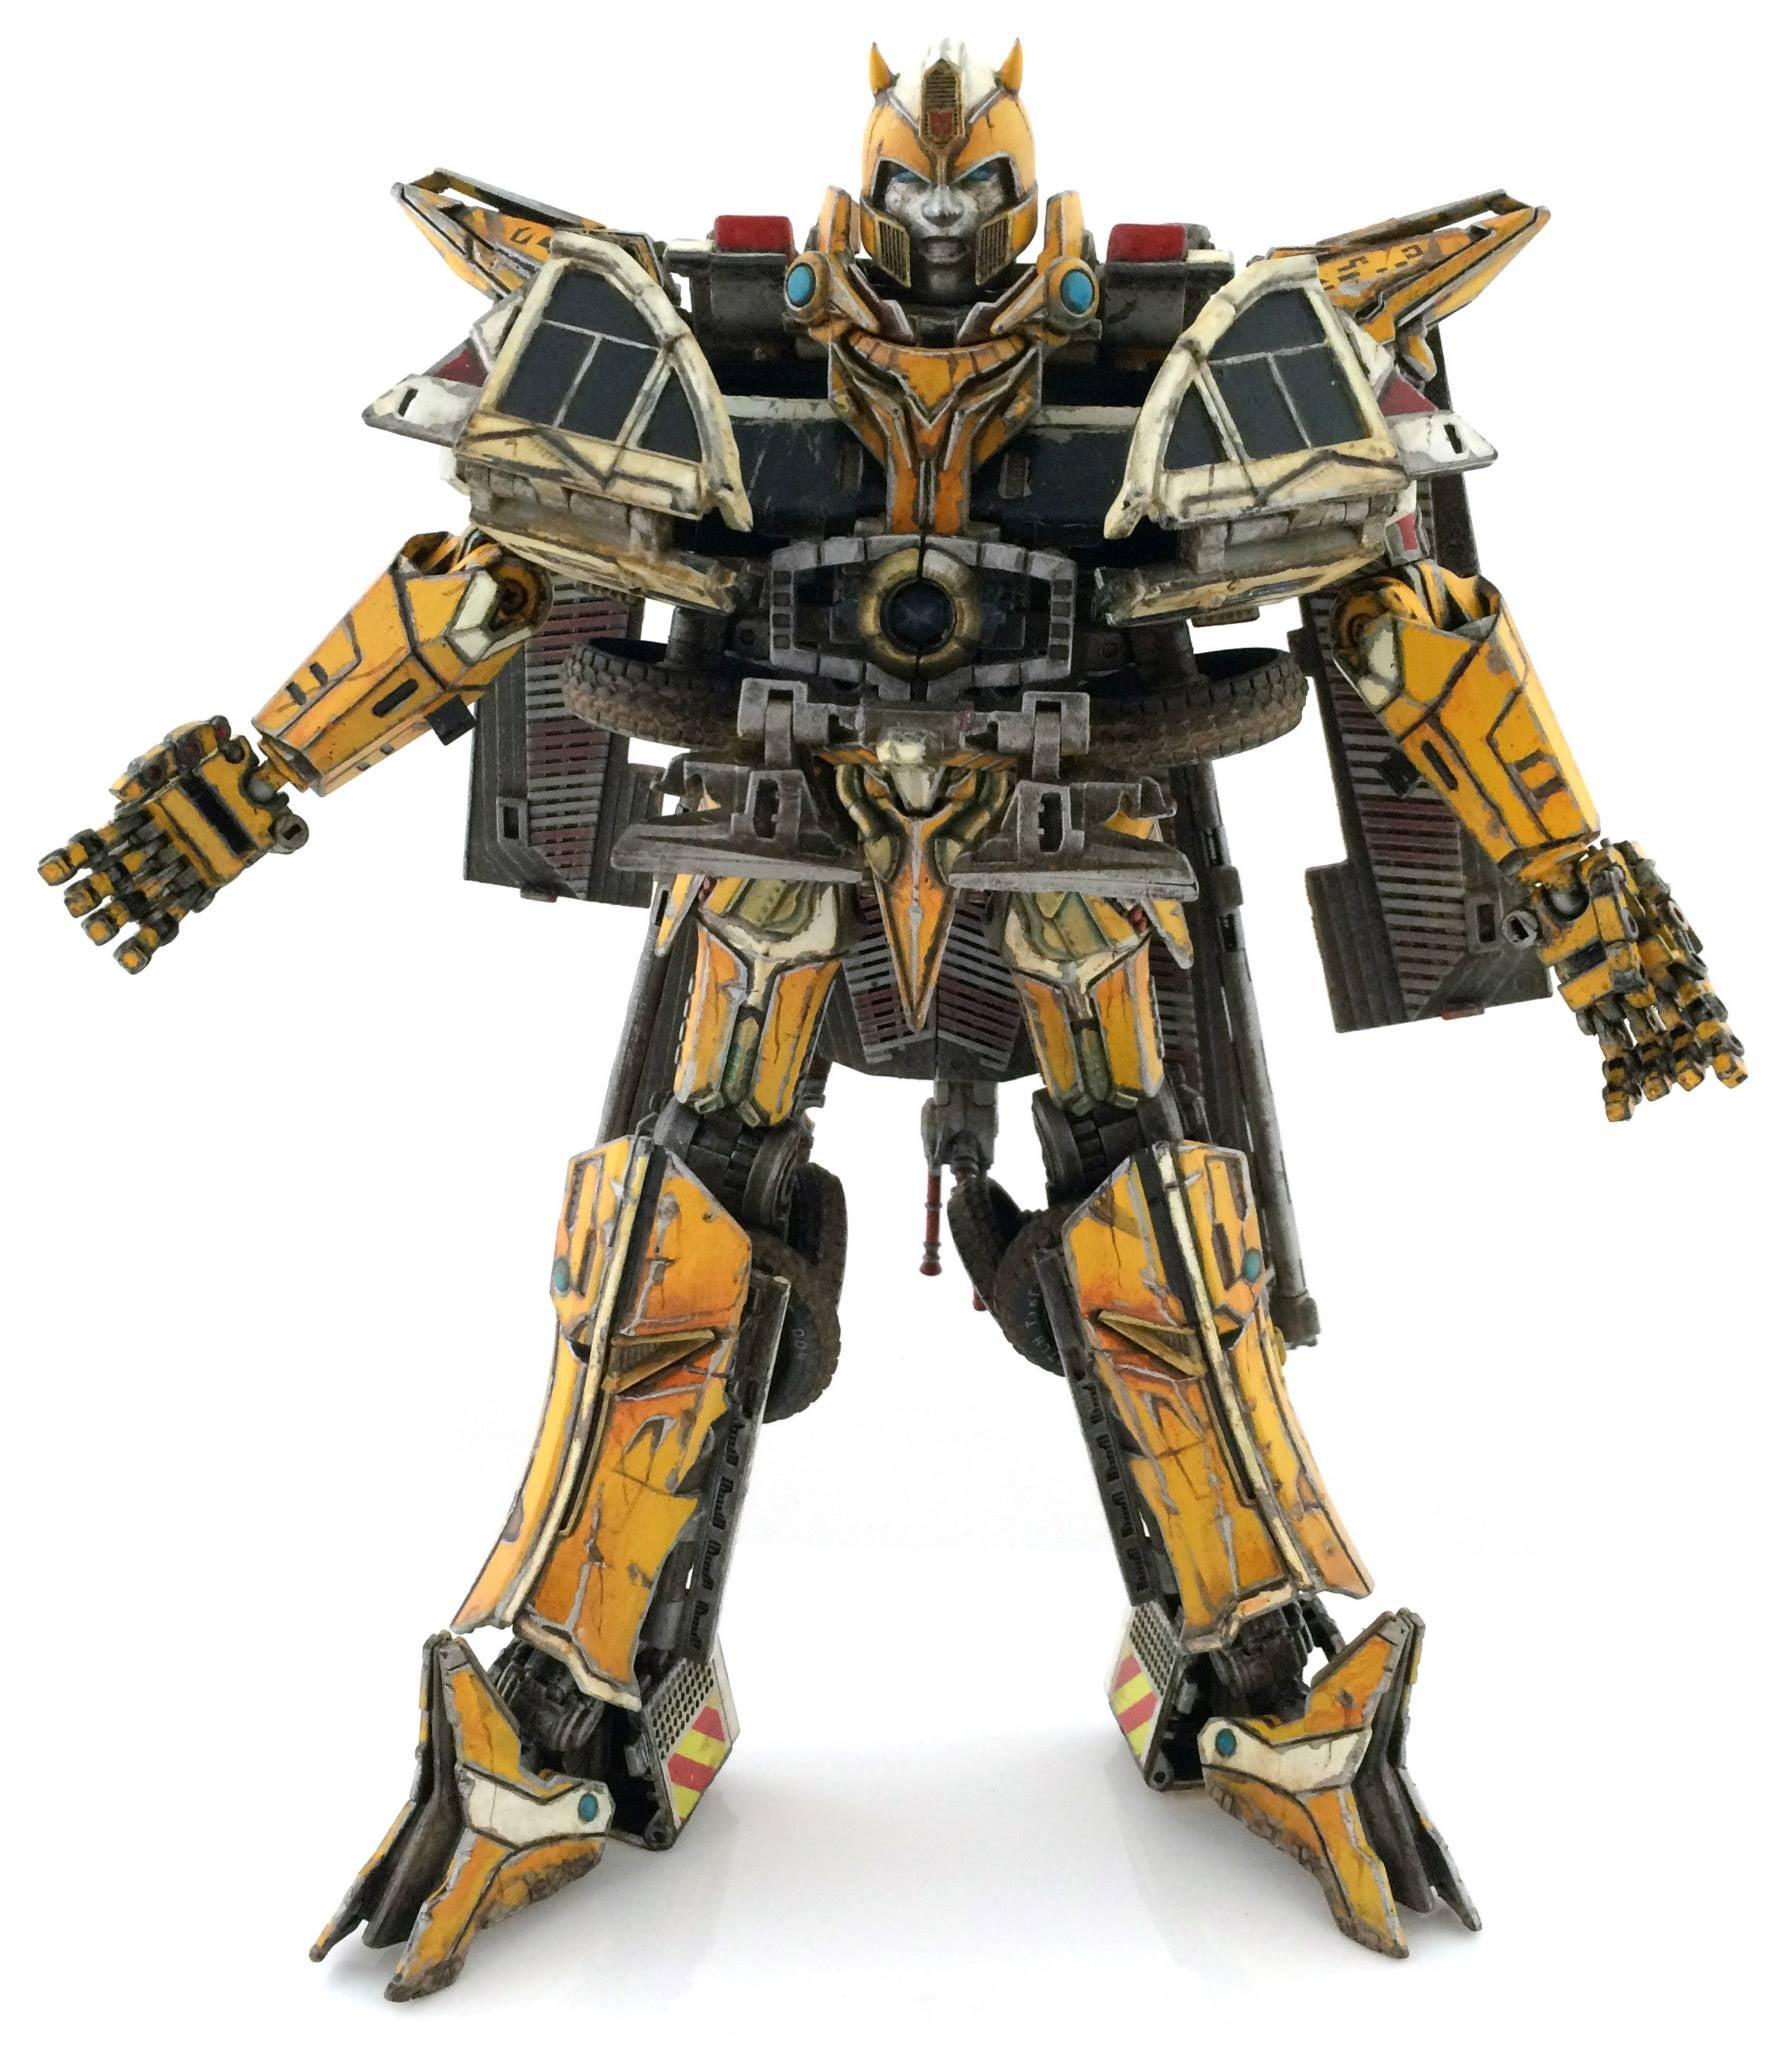 A Custom Transformer Worthy Of Wielding The Matrix Of